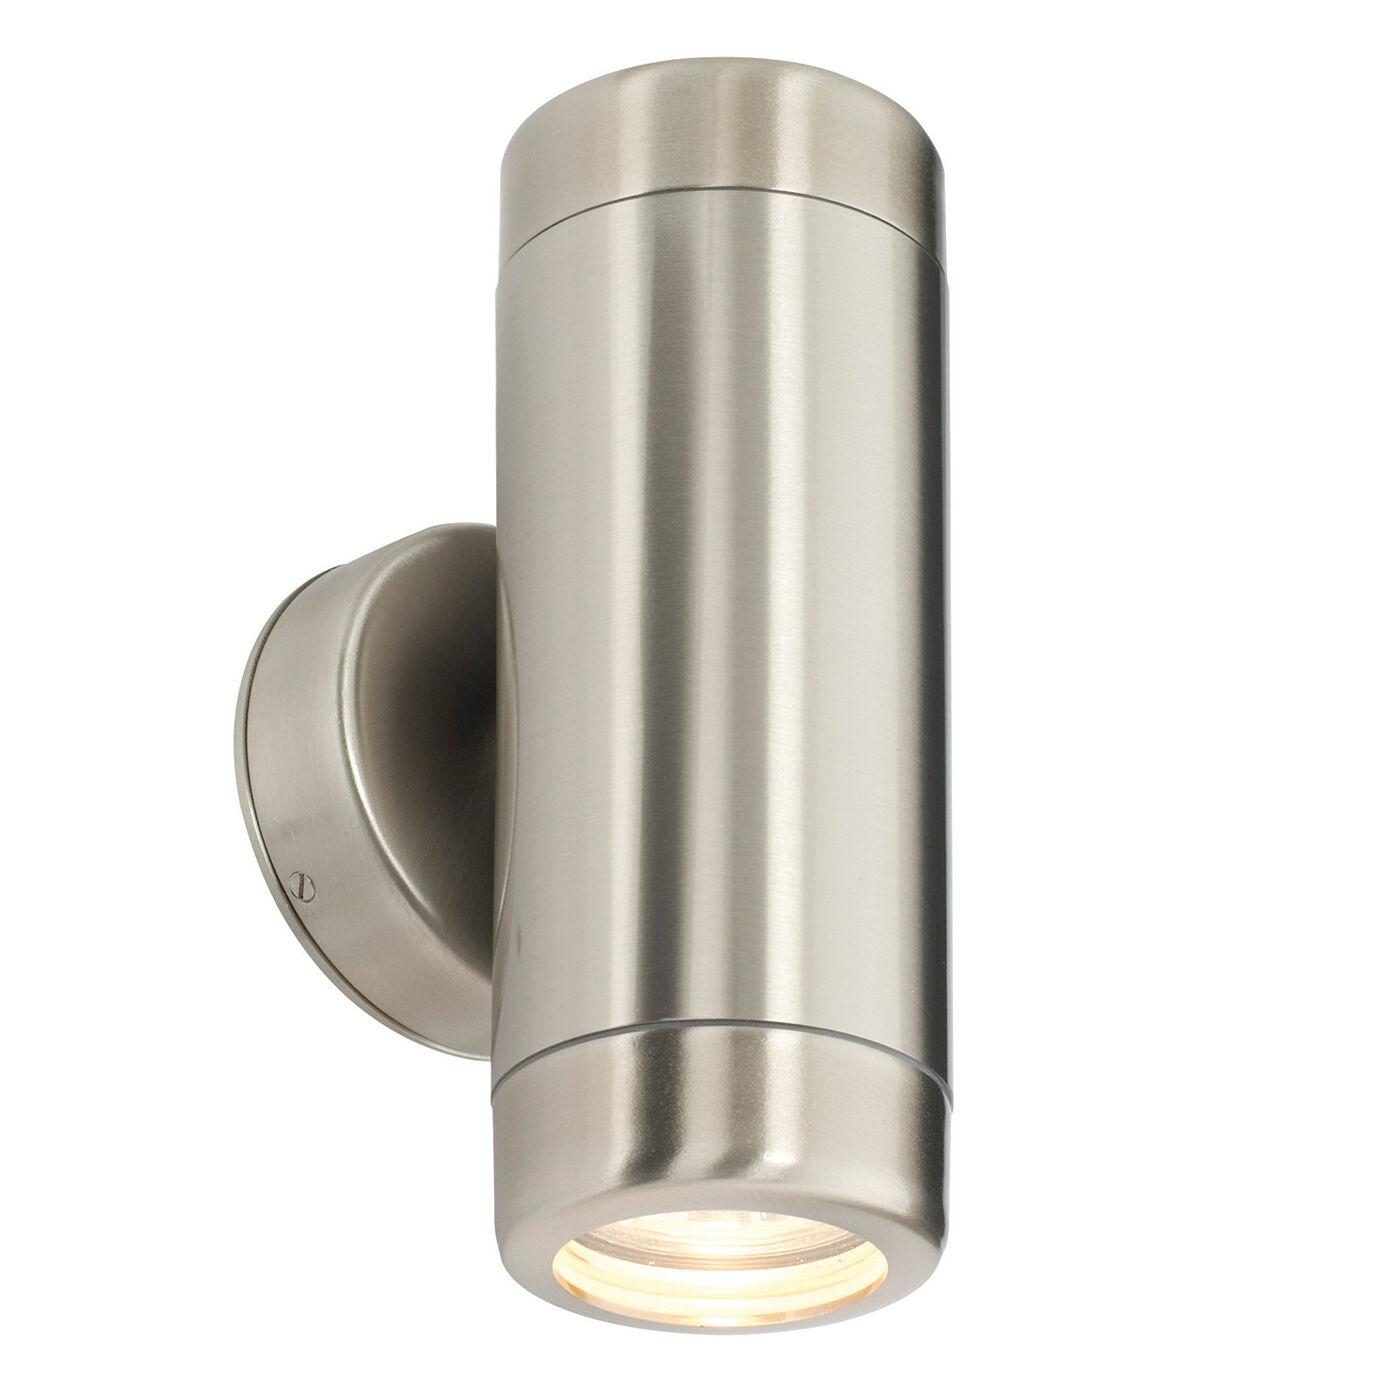 Saxby Atlantis 35W Adjustable Marine Grade Brushed Stainless Steel Modern Outdoor IP65 Wall Spot Light